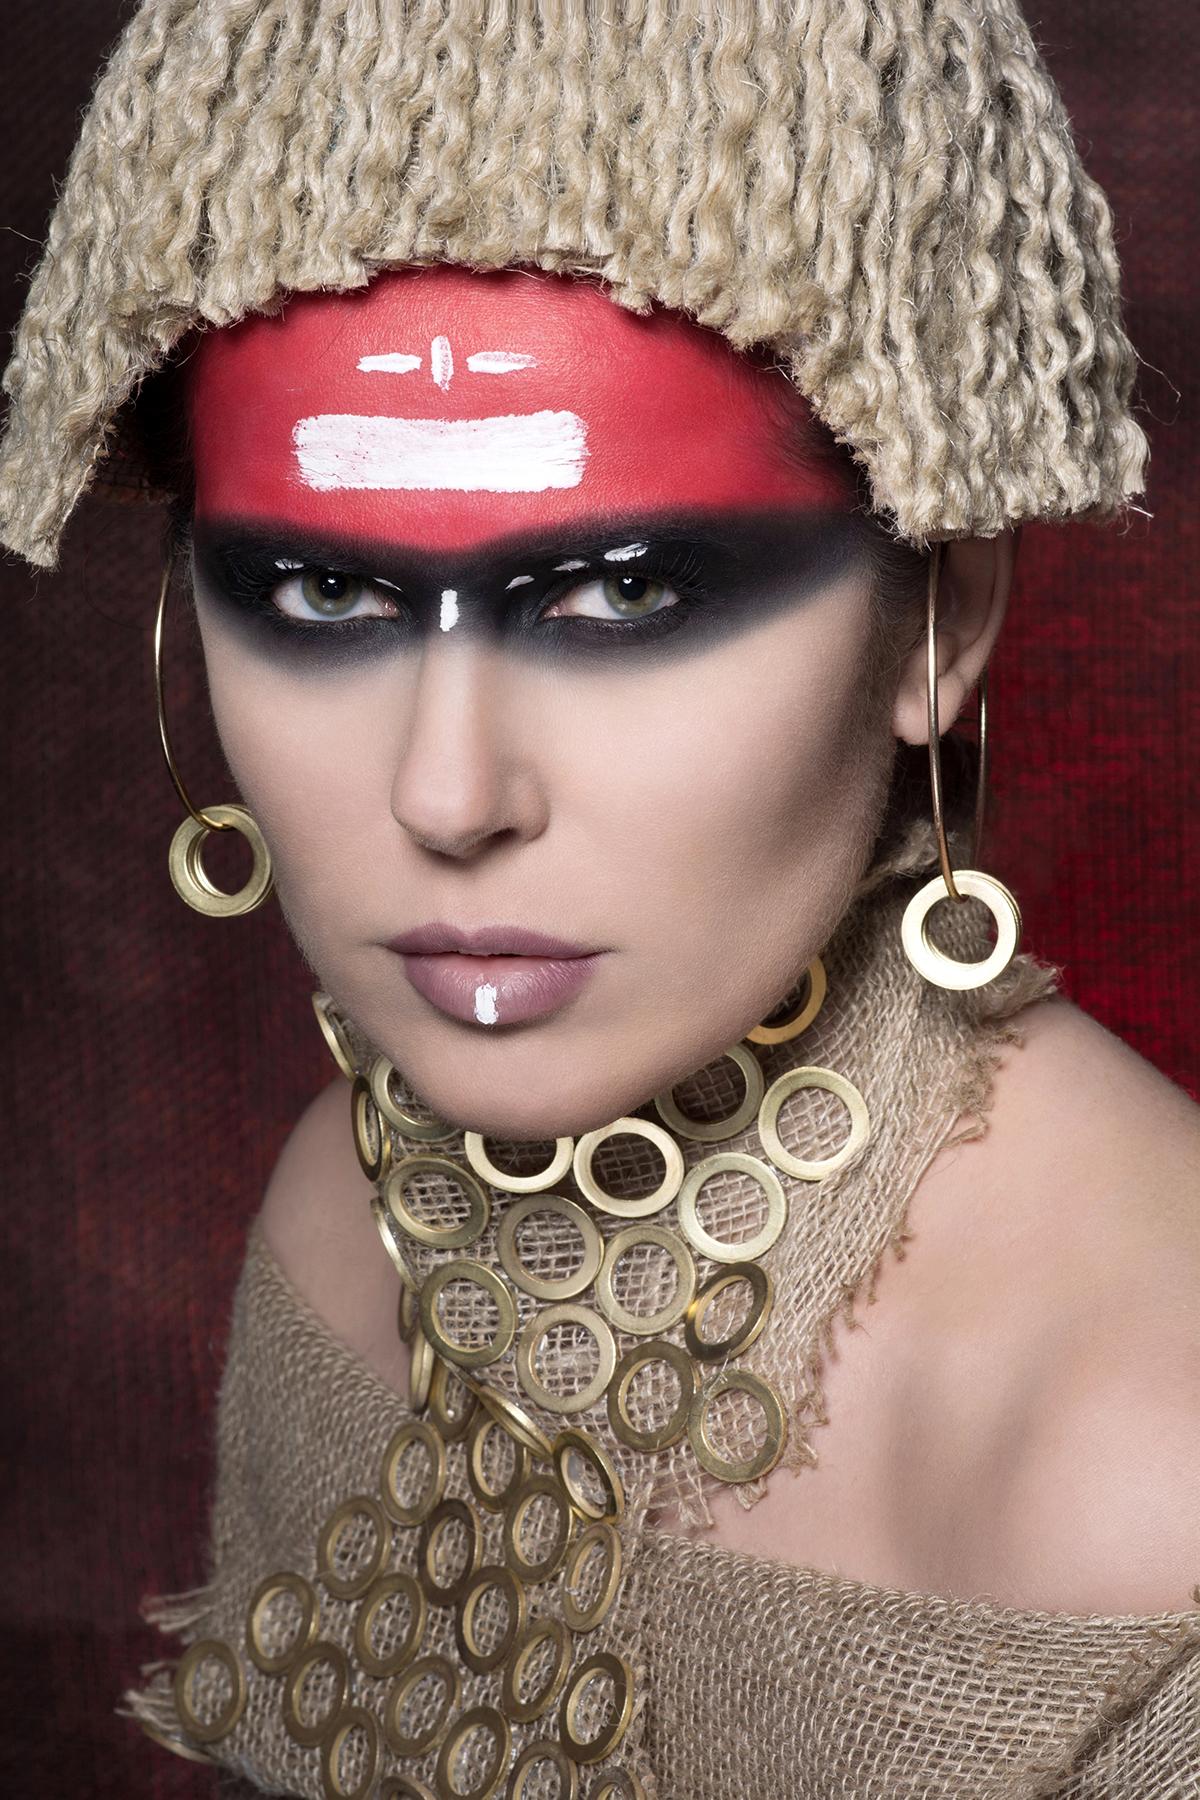 Monika Kiernicka- Around the world